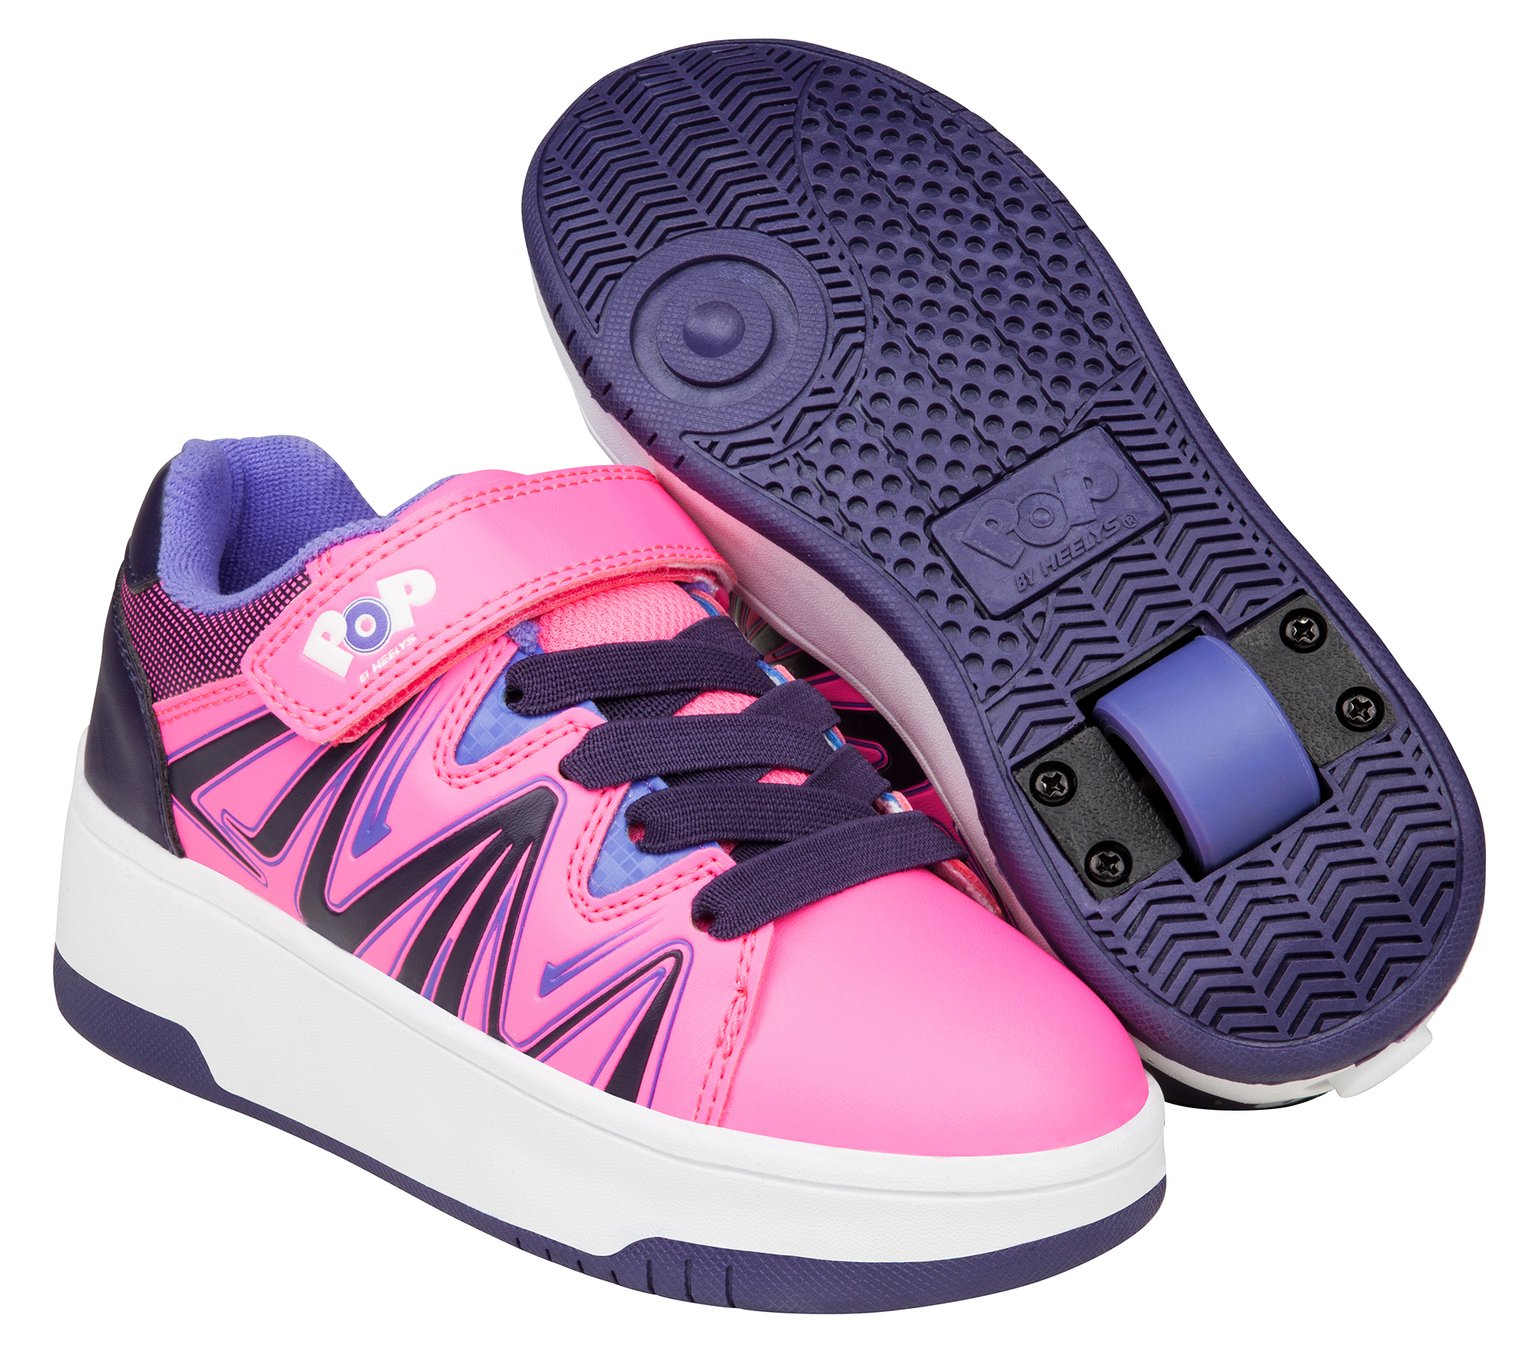 POP By Heelys Pink Burst - Size 2